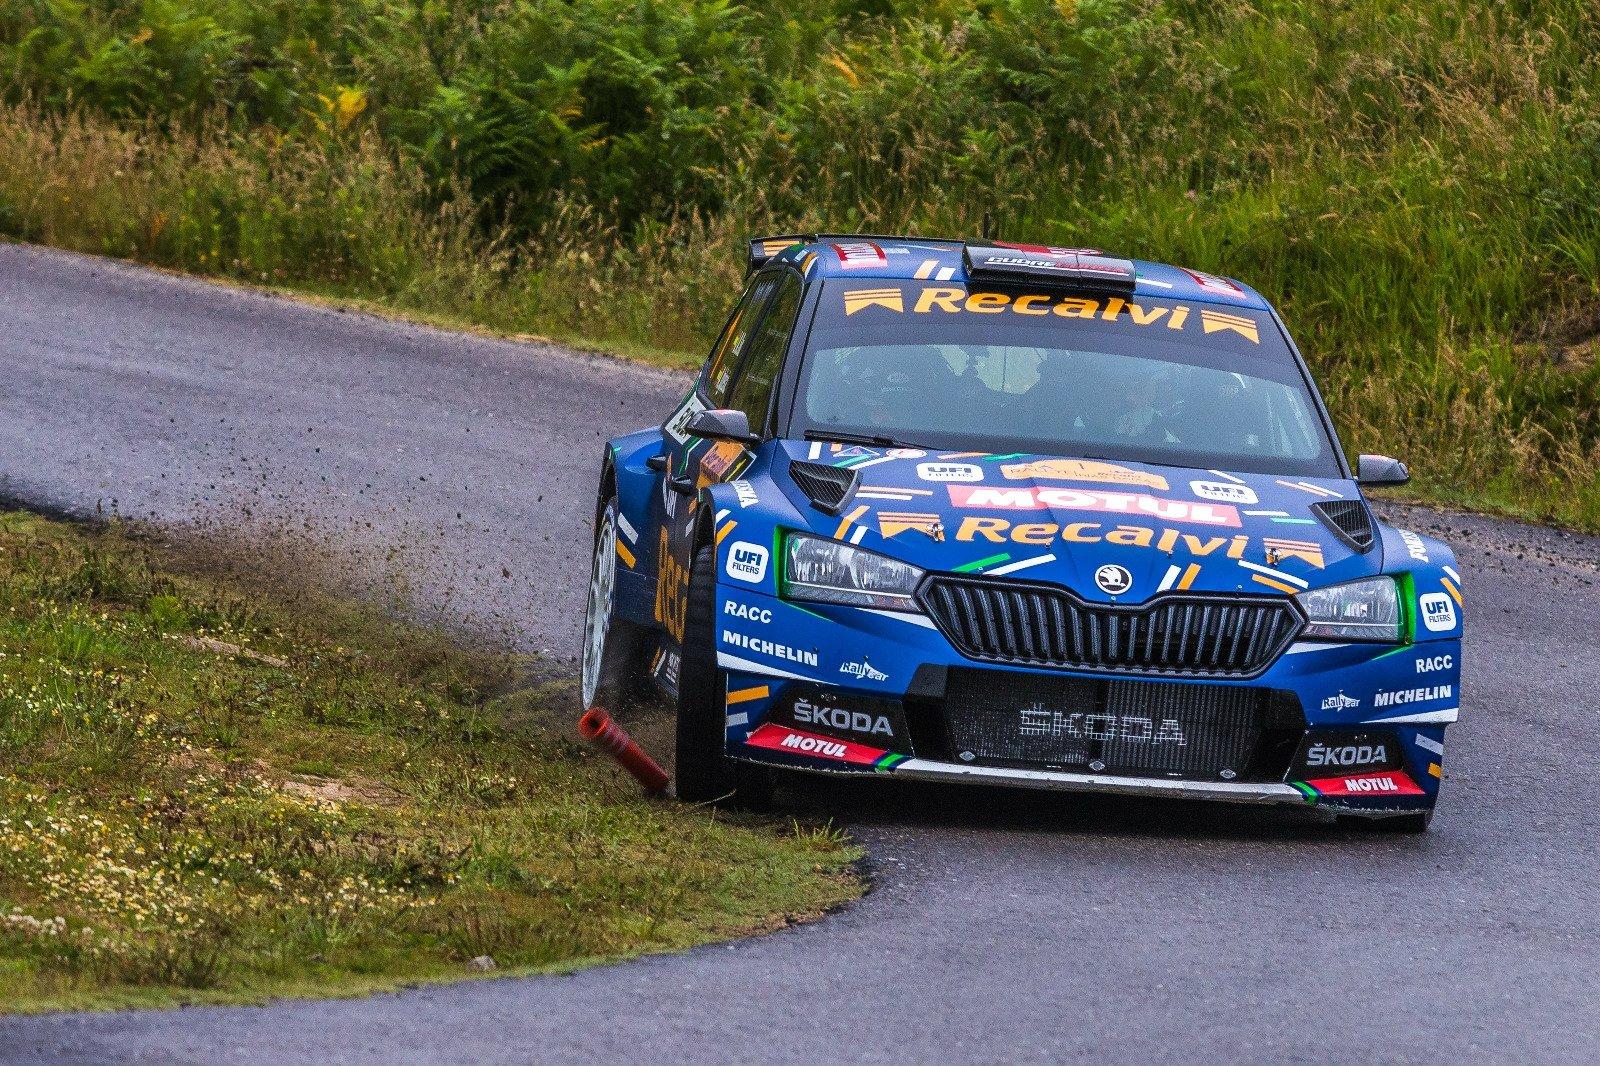 CERA: 54º Rallye Recalvi Rias Baixas [23-25 Julio] E7E4hkIWUAgnwsC?format=jpg&name=large